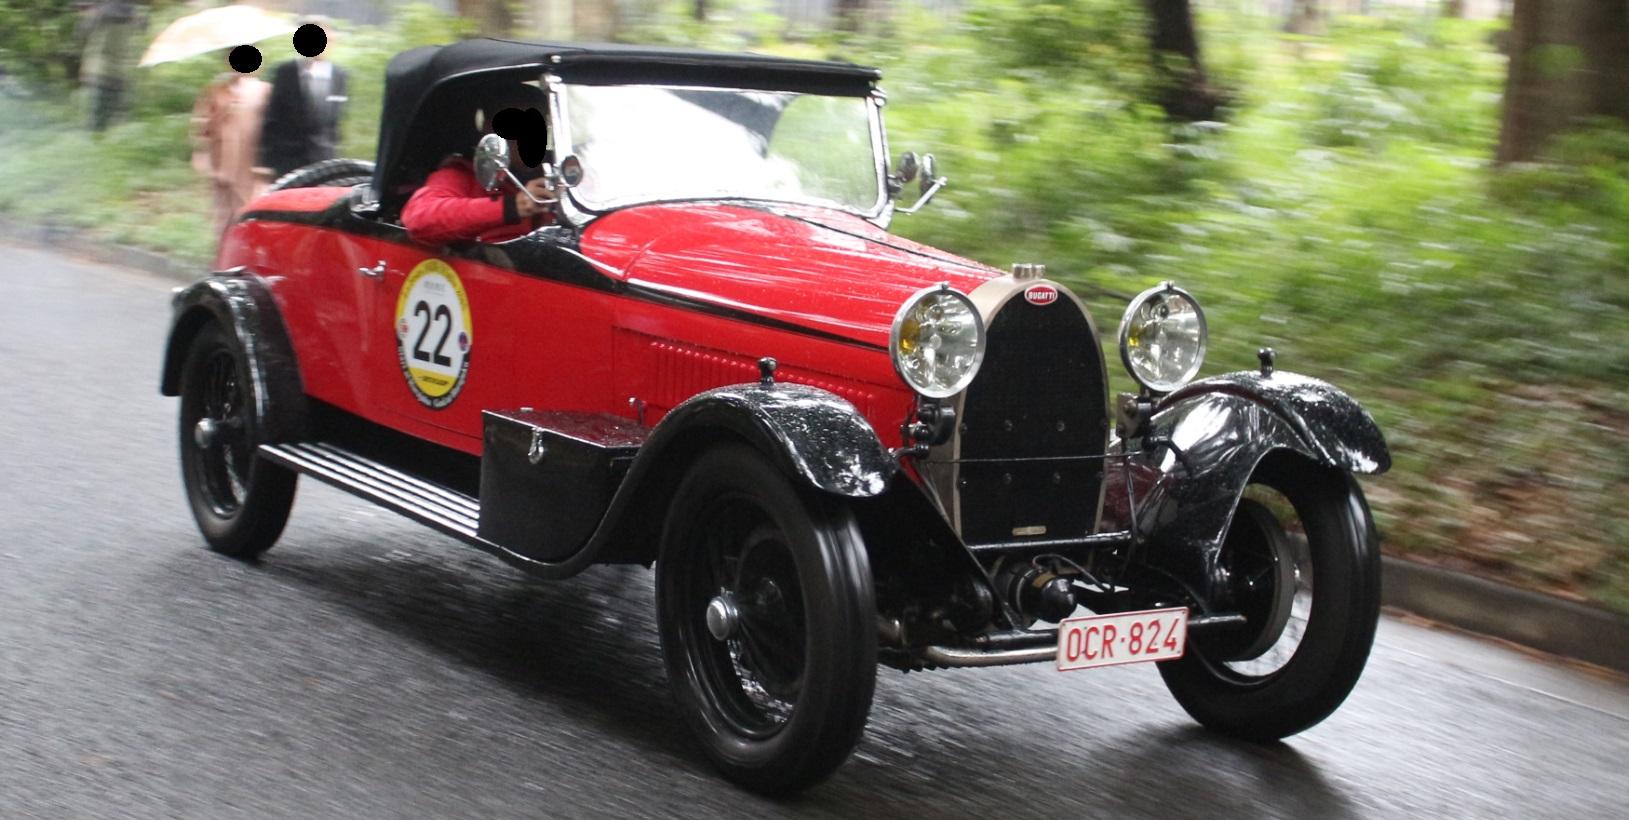 Bugatti, Bugatti T44 Torpedo, International Bugatti Meeting Japan, La Festa Mille Miglia, LFMM, T44, ブガッティ, ラフェスタミレミリア